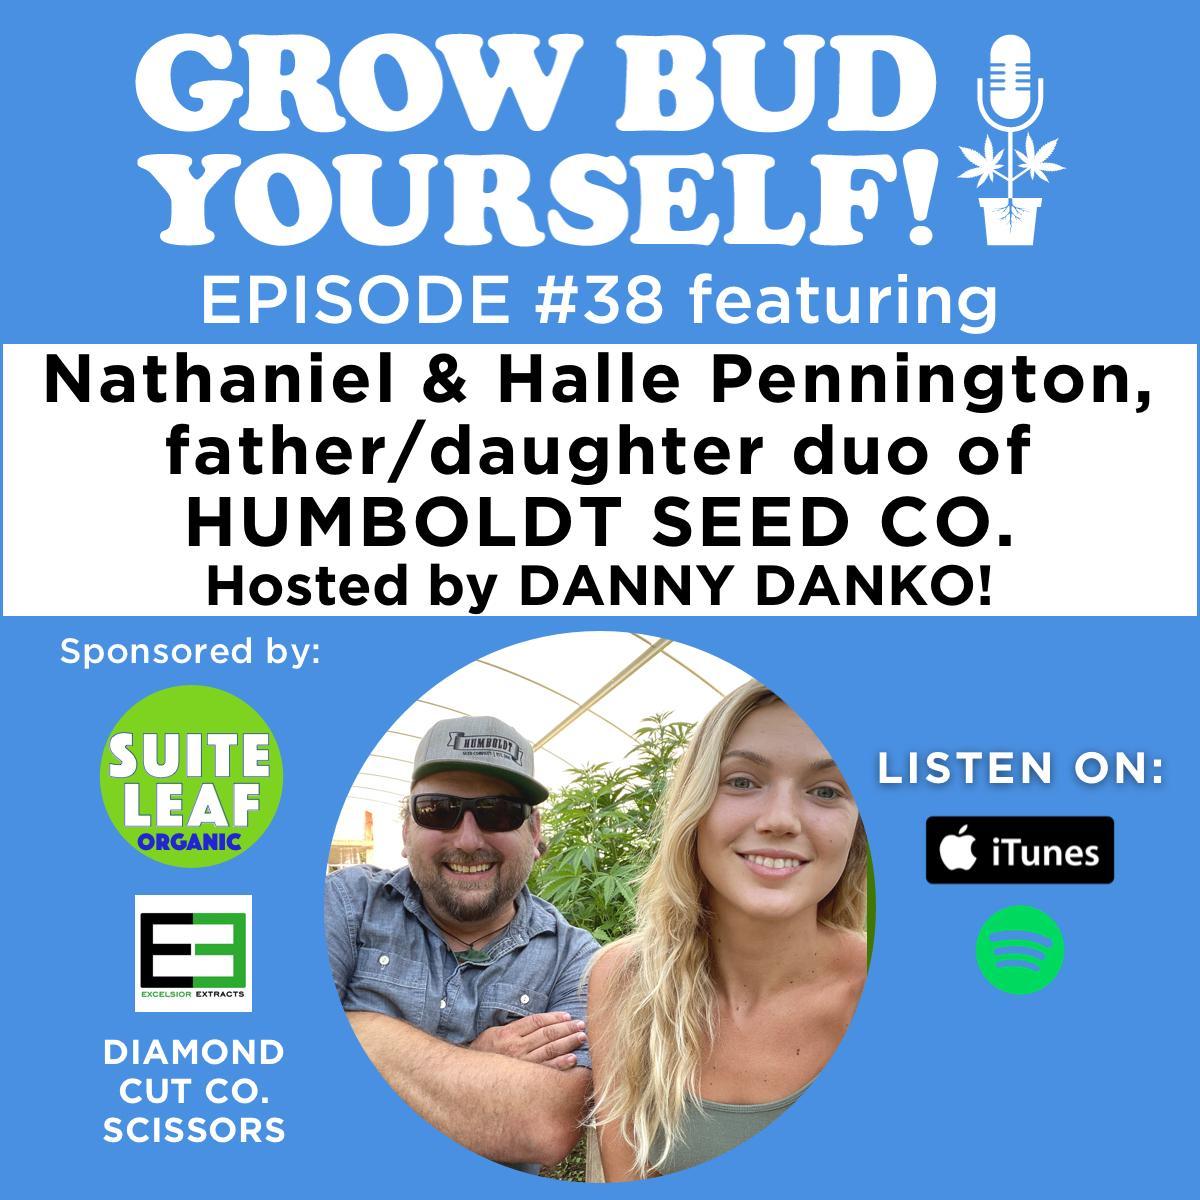 Grow Bud Yourself